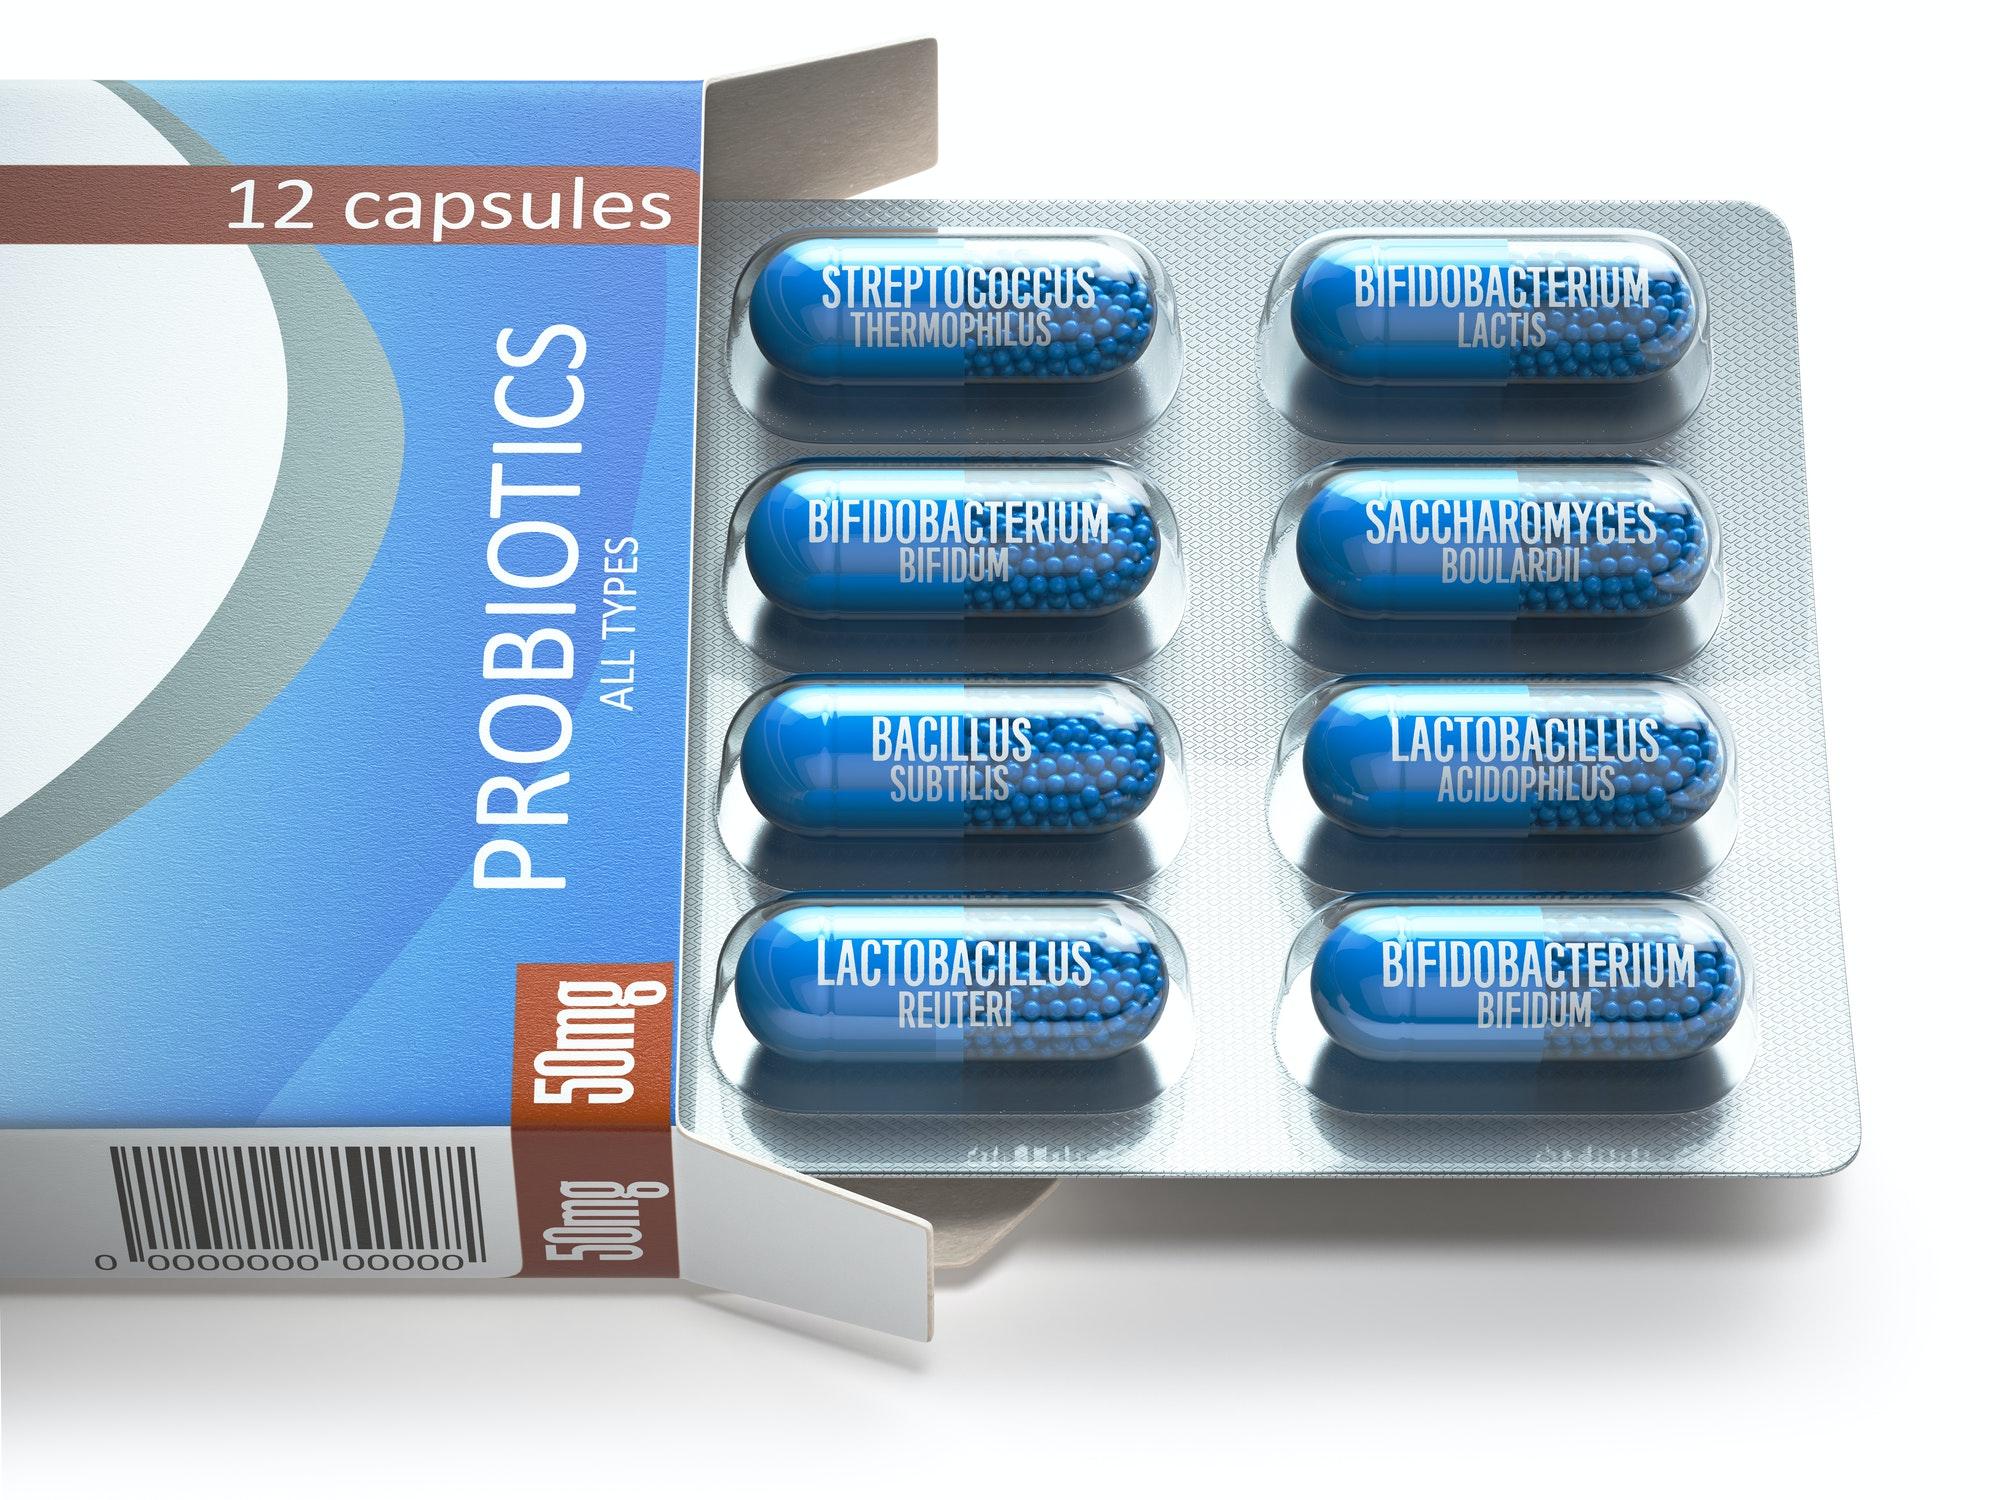 Probiotics. Blister box with all types of probiotics capsules. P